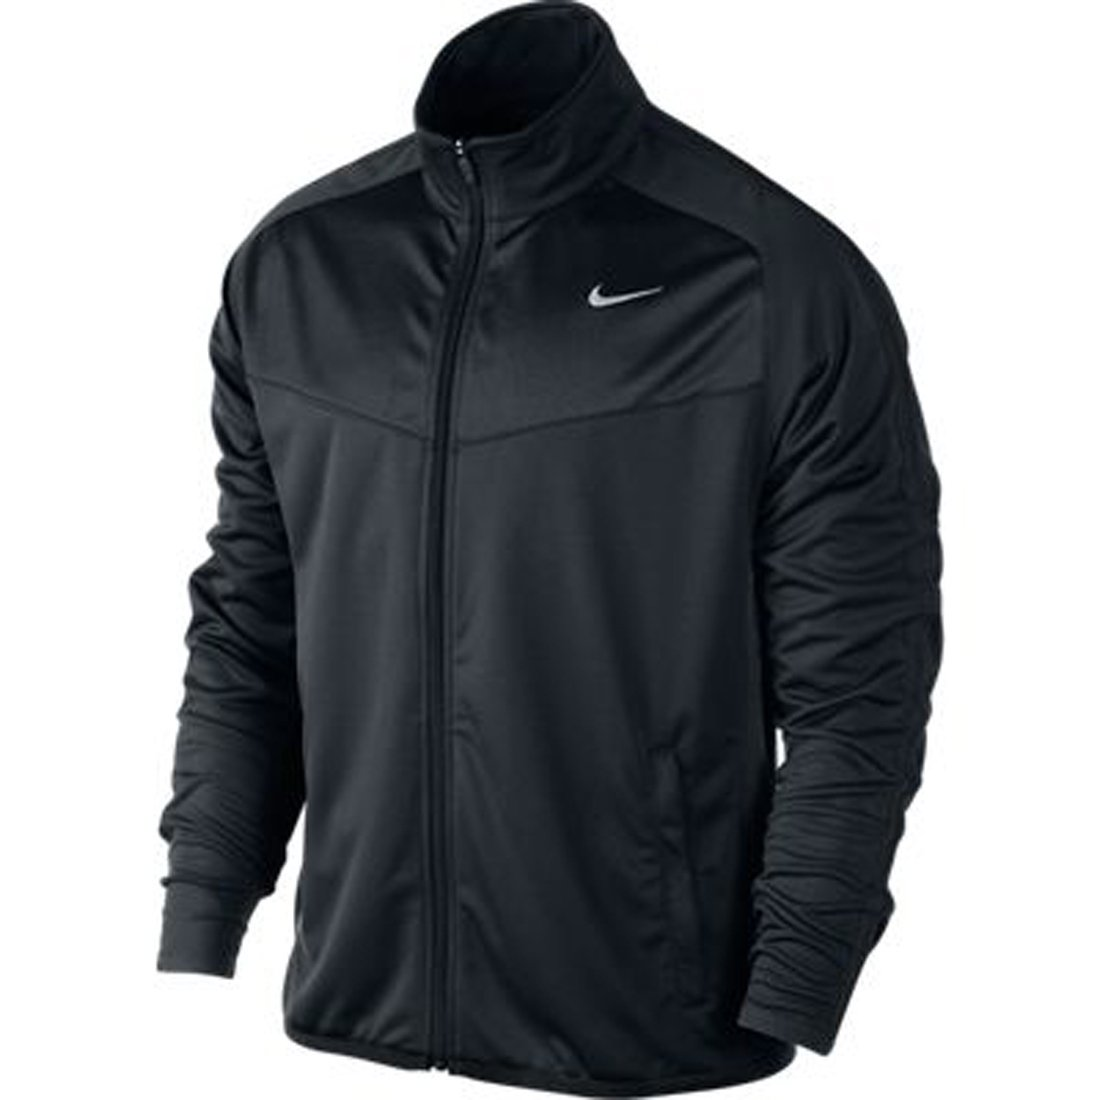 nike free trainer amazon womens jackets